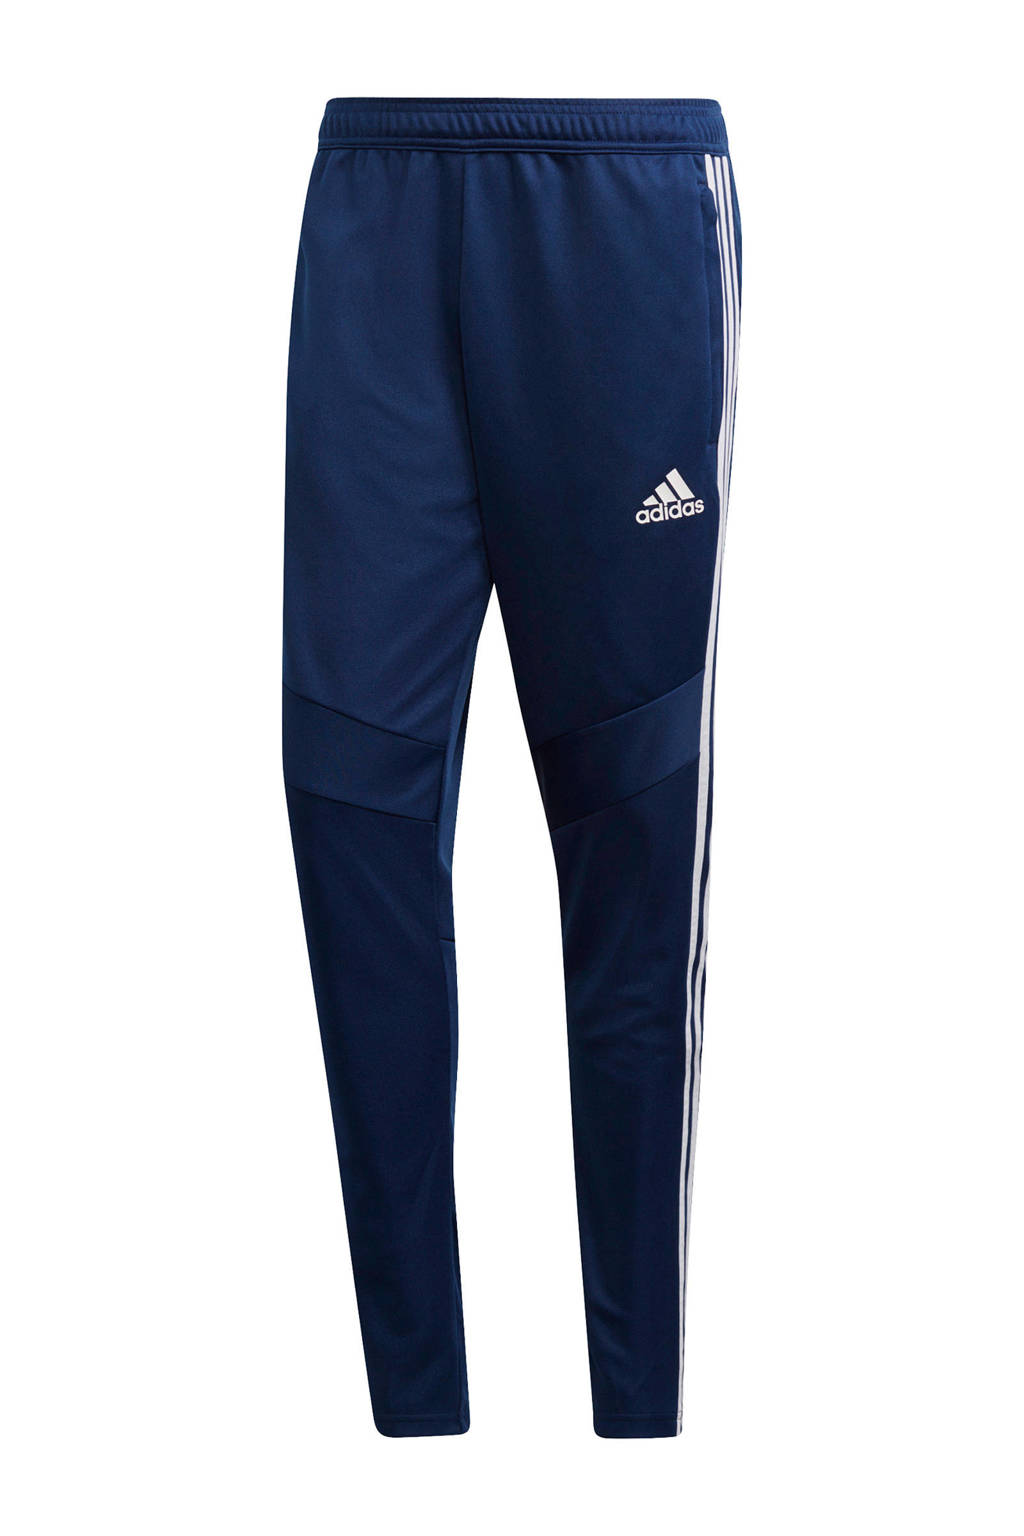 adidas Performance   sportbroek Tiro 19 donkerblauw, Donkerblauw